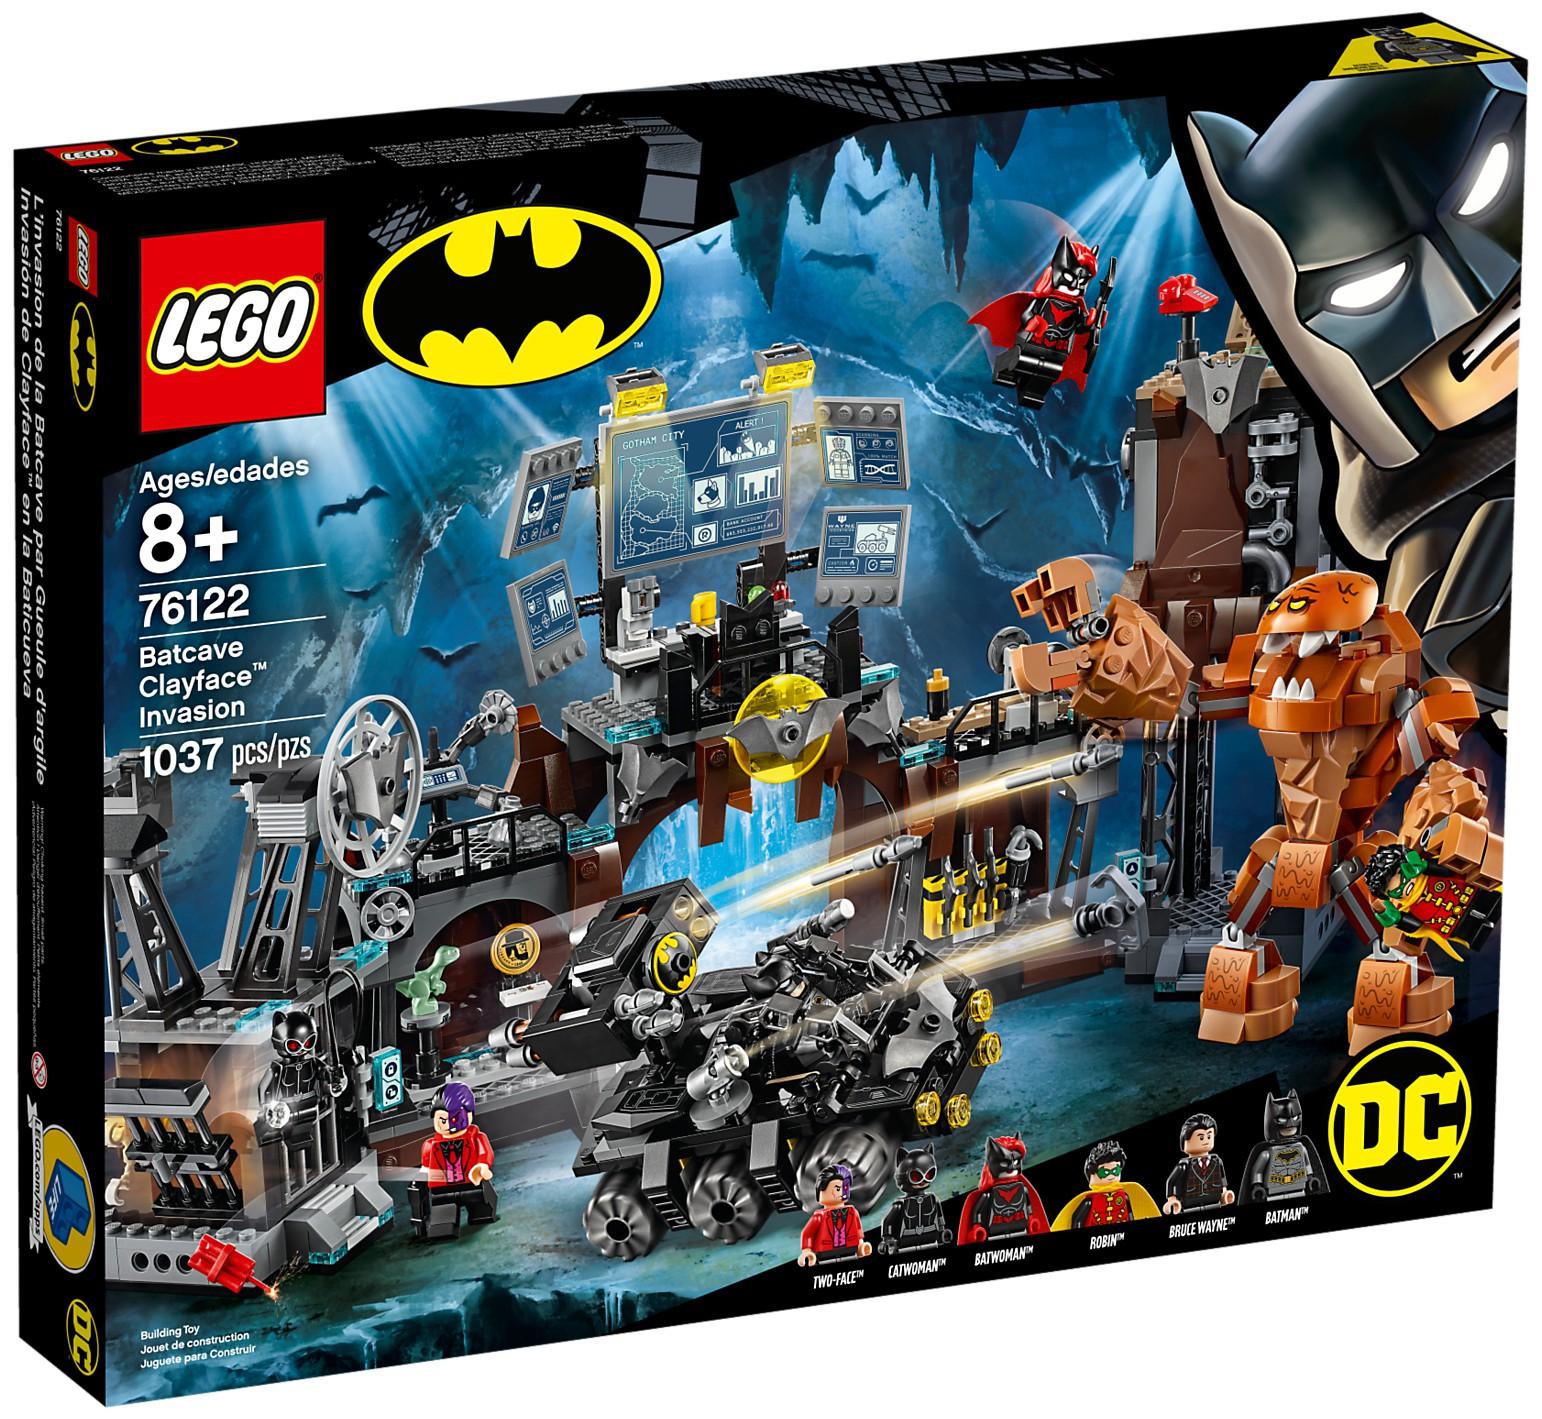 76122 Batcave Clayface Invasion